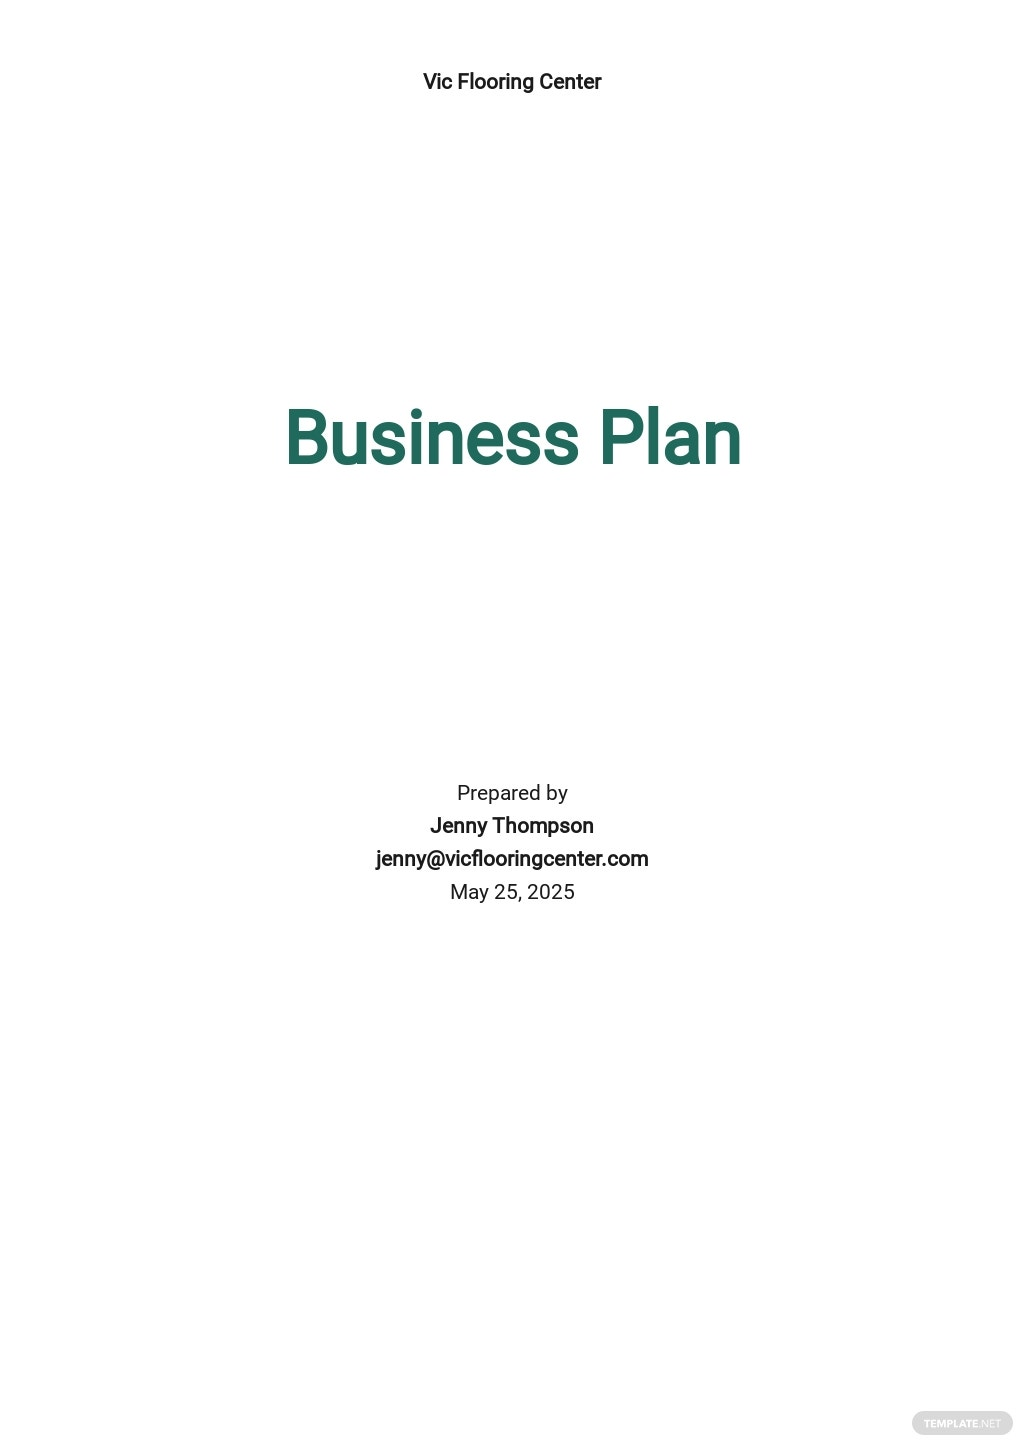 Flooring Company Business Plan Template